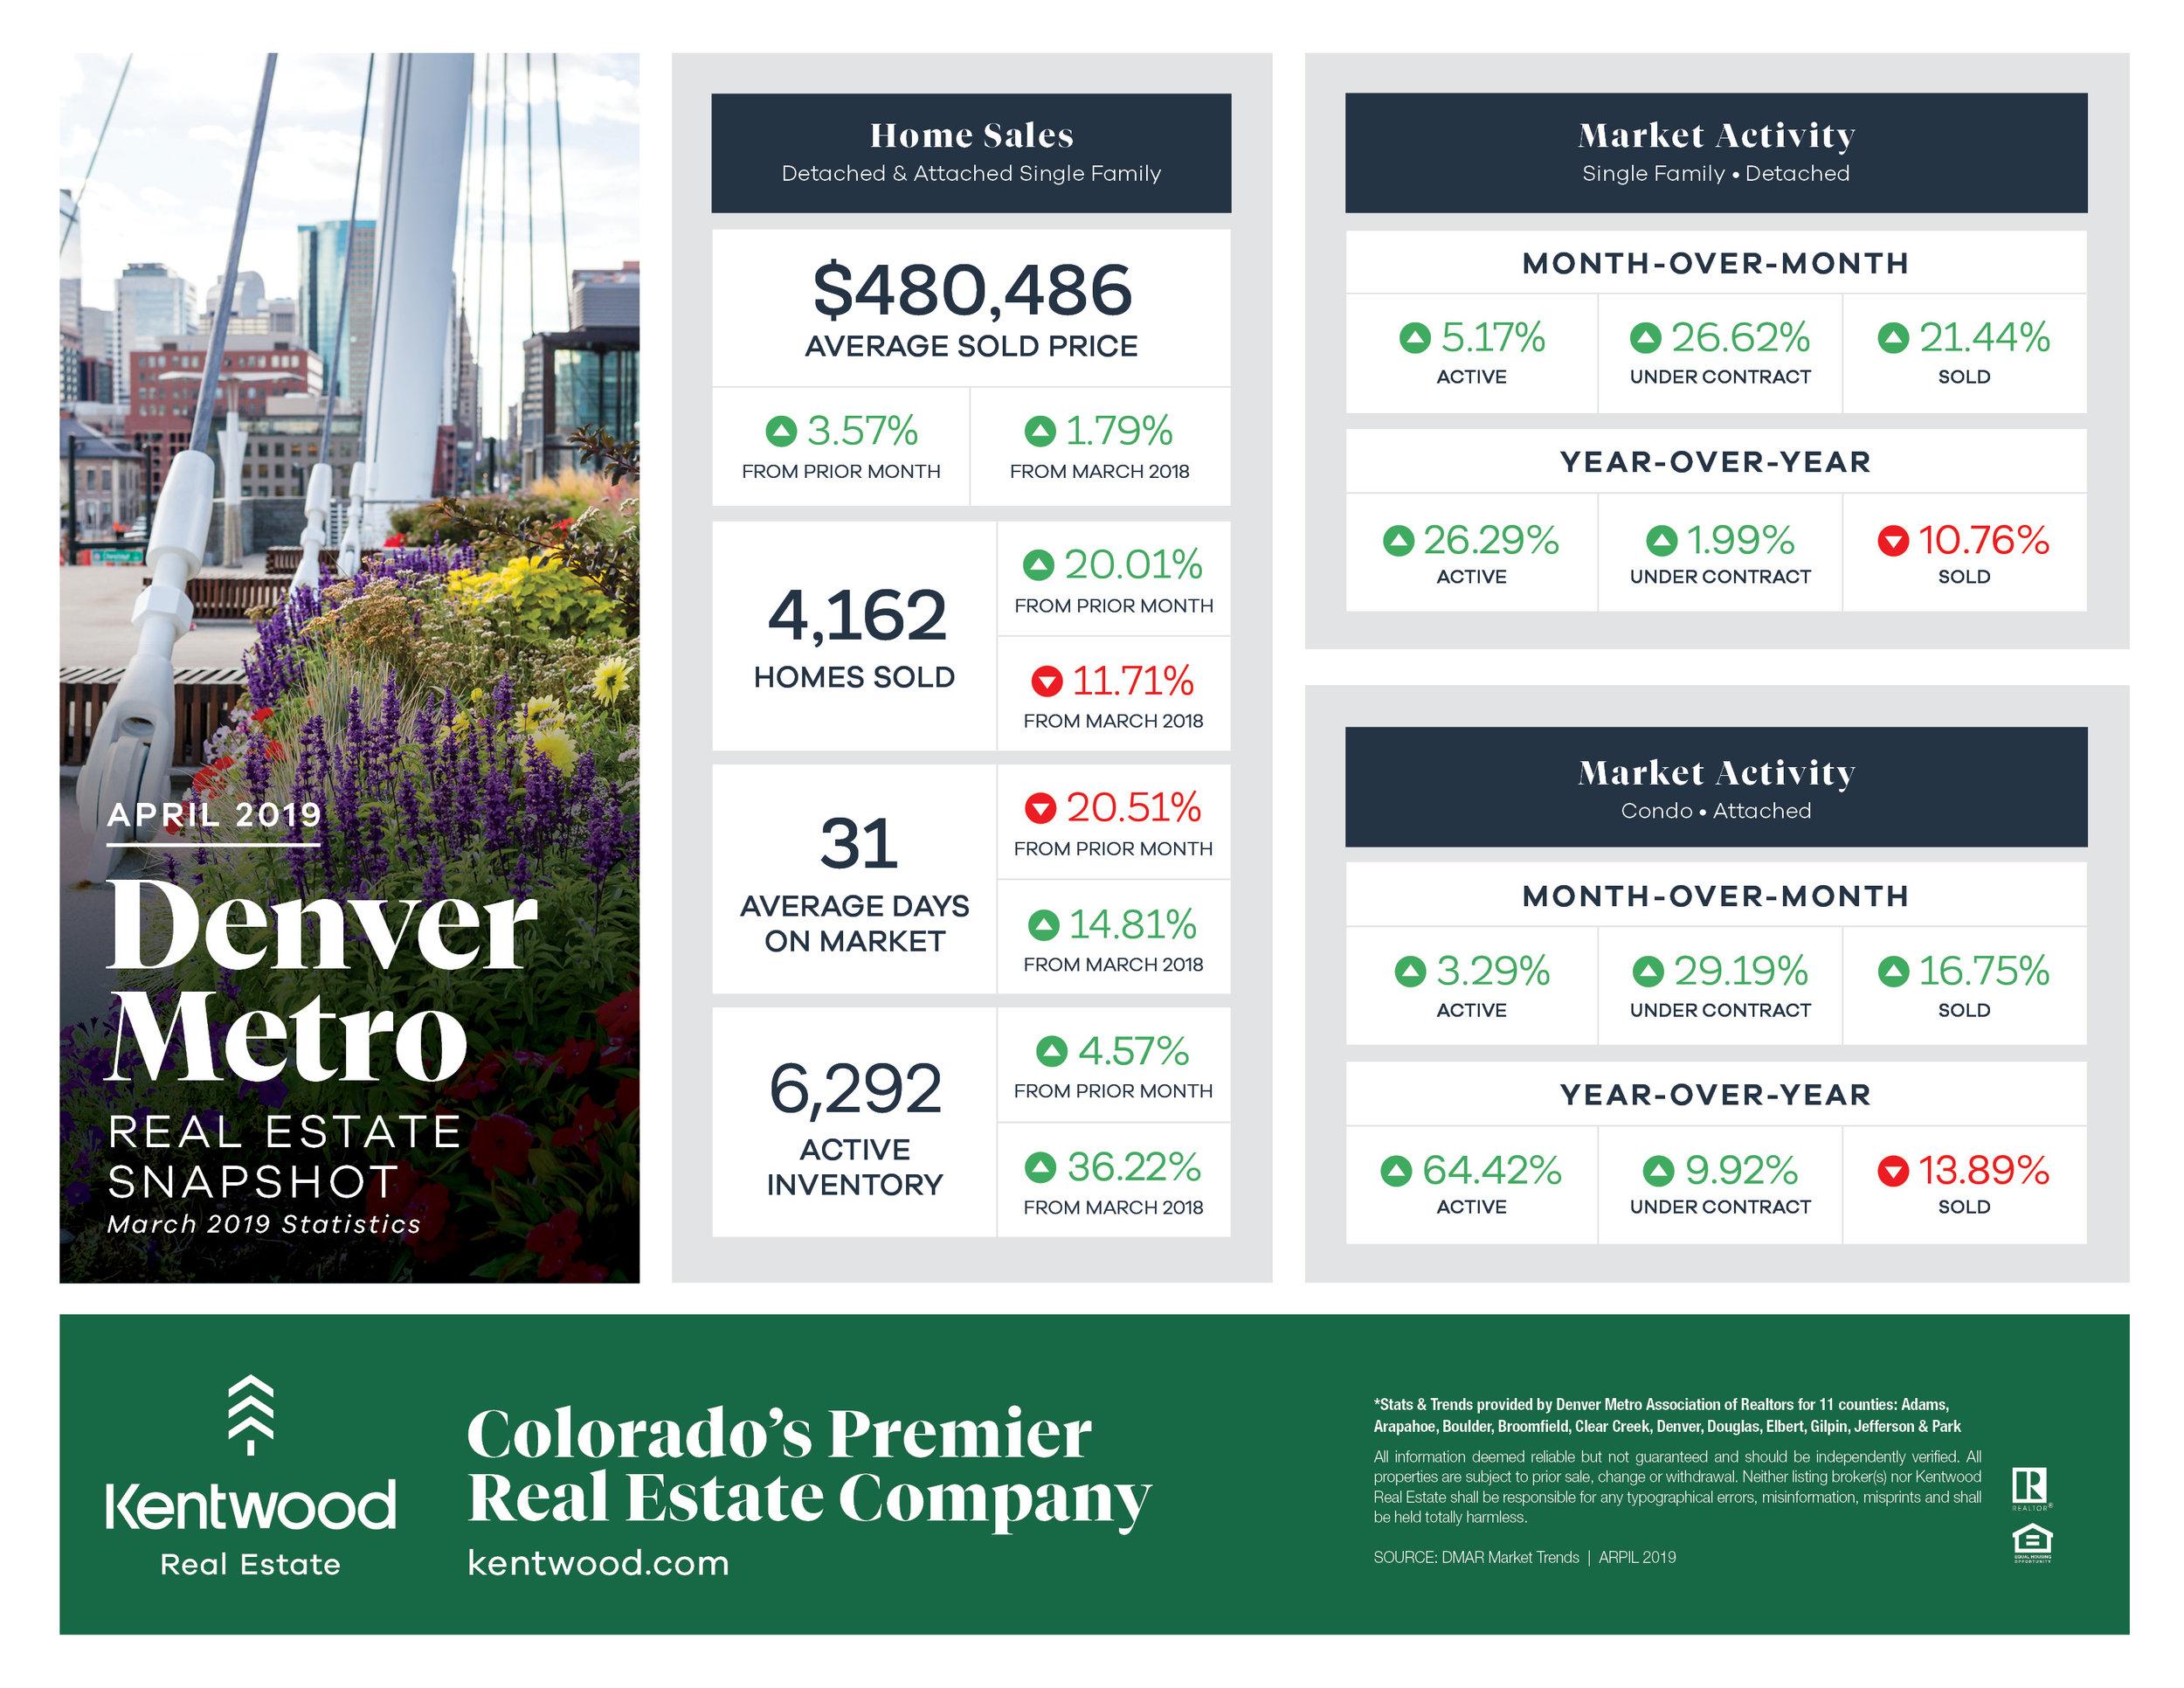 April_Denver_Metro_StatsUpdatedBranding.jpg